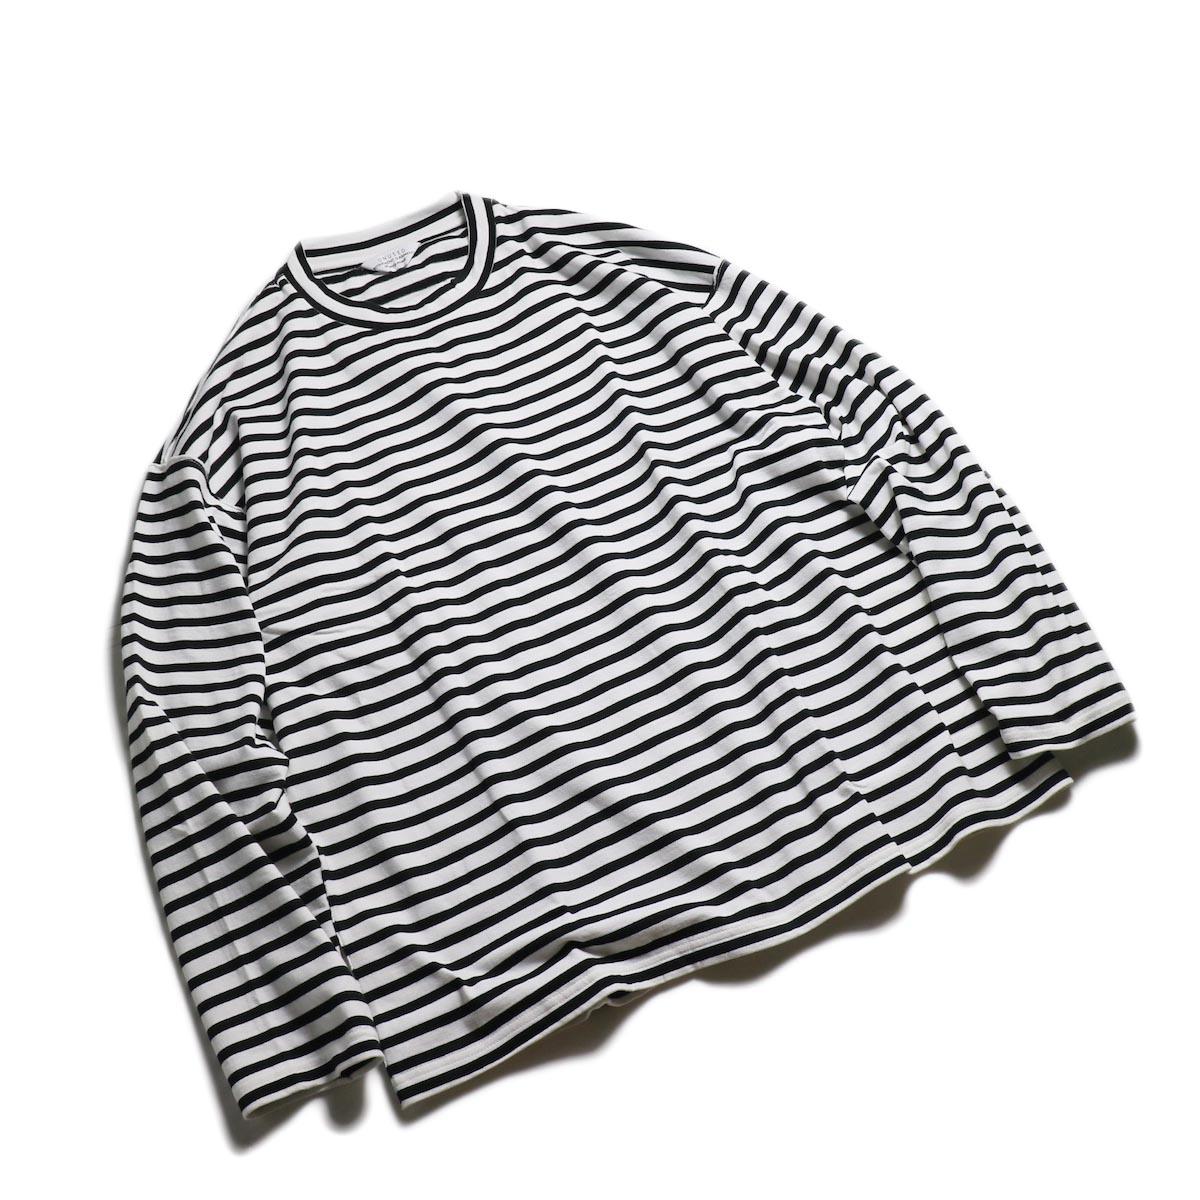 UNUSED / US1682 Long Sleeve Border T-Shirt -White/Black 全体